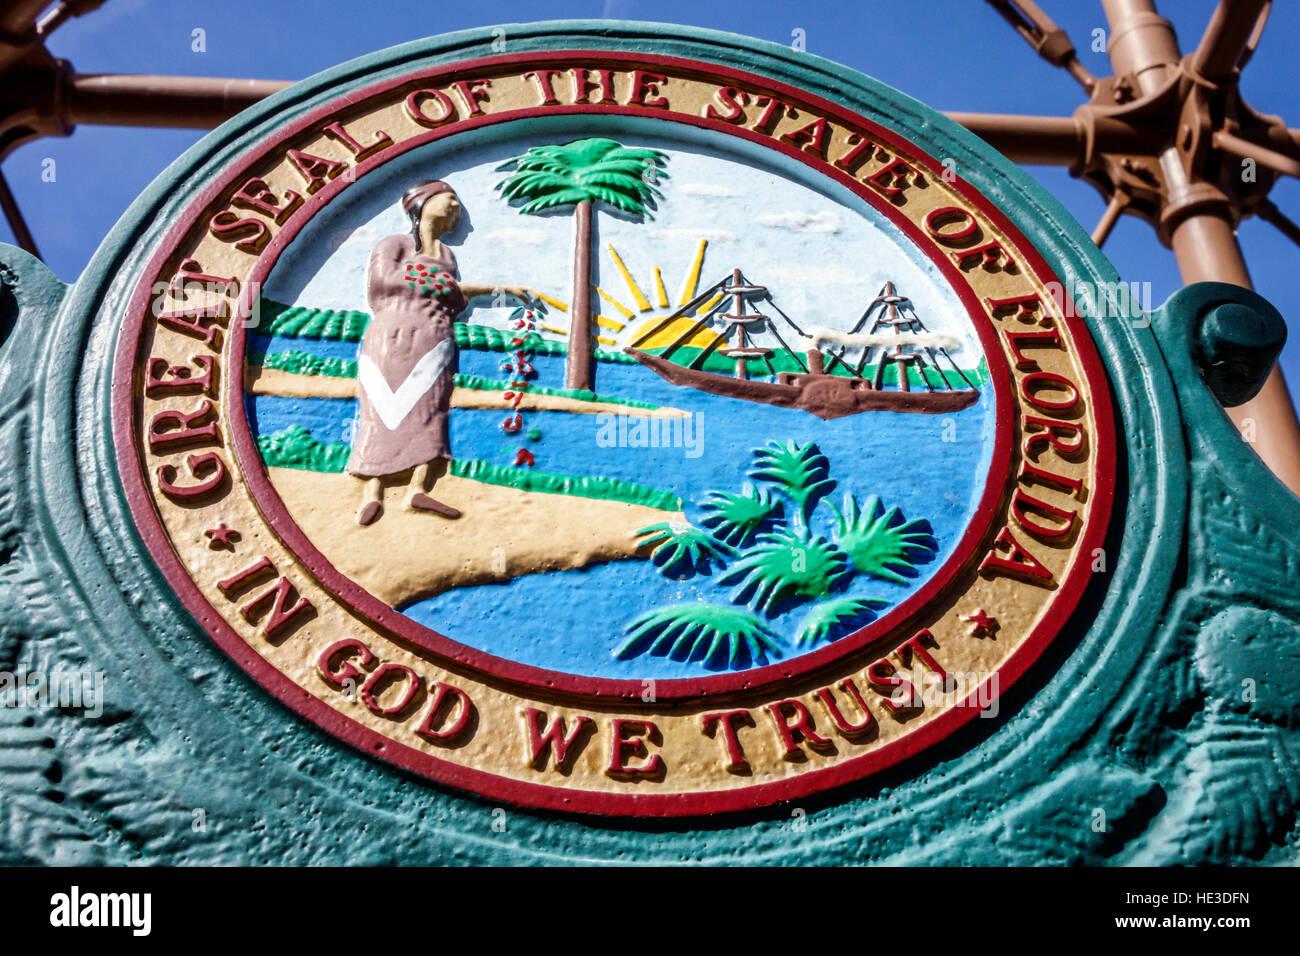 En Sanibel Island, Florida Sanibel Island Lighthouse PUNTO DE LUZ LUZ Ybel Gran Sello Estado Imagen De Stock